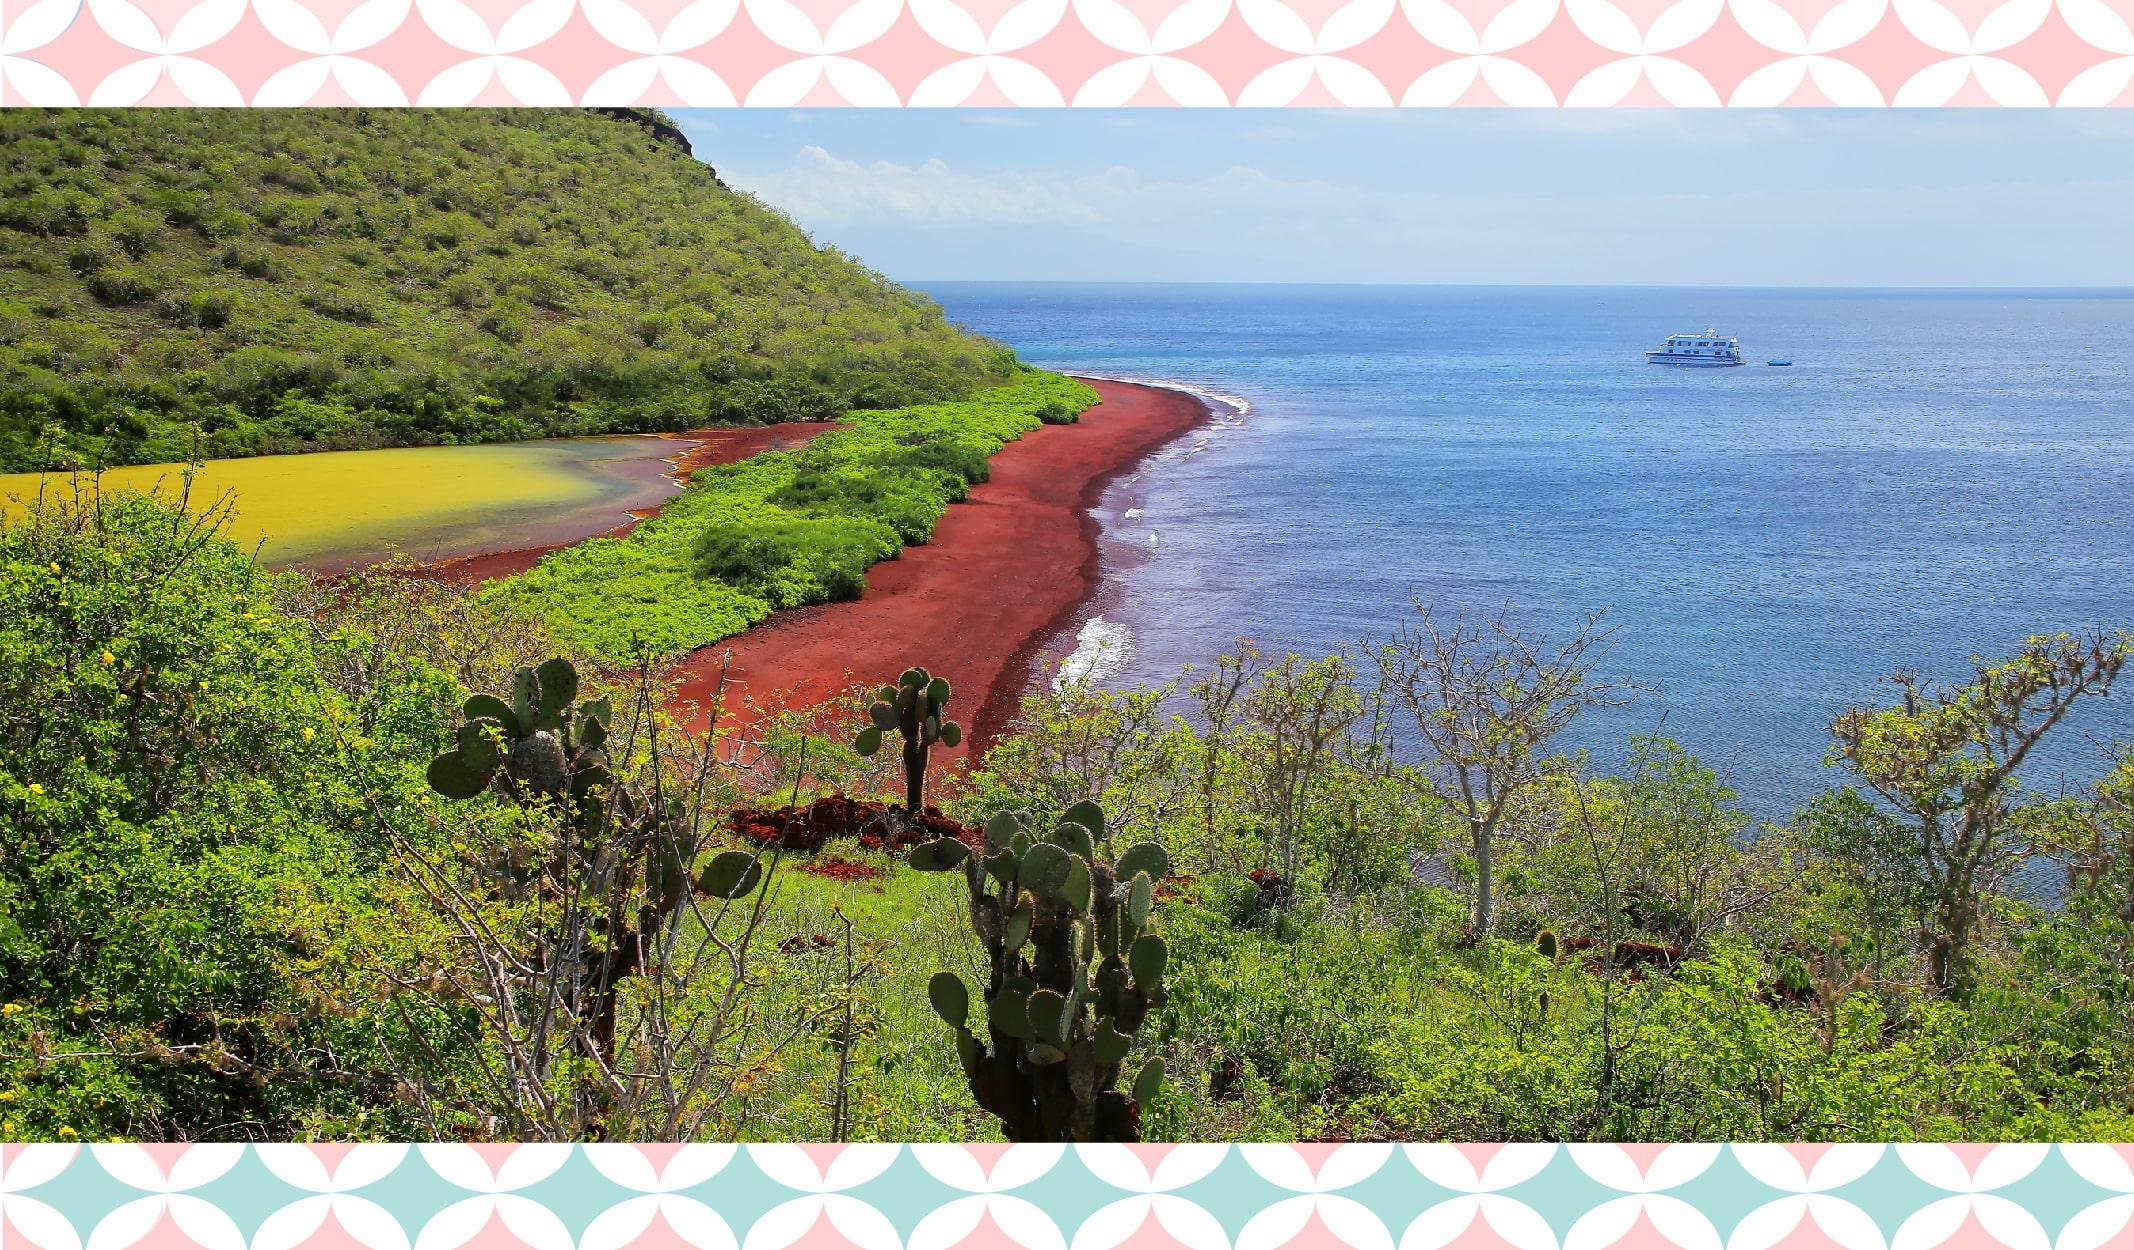 en güzel plajlar, ekvator